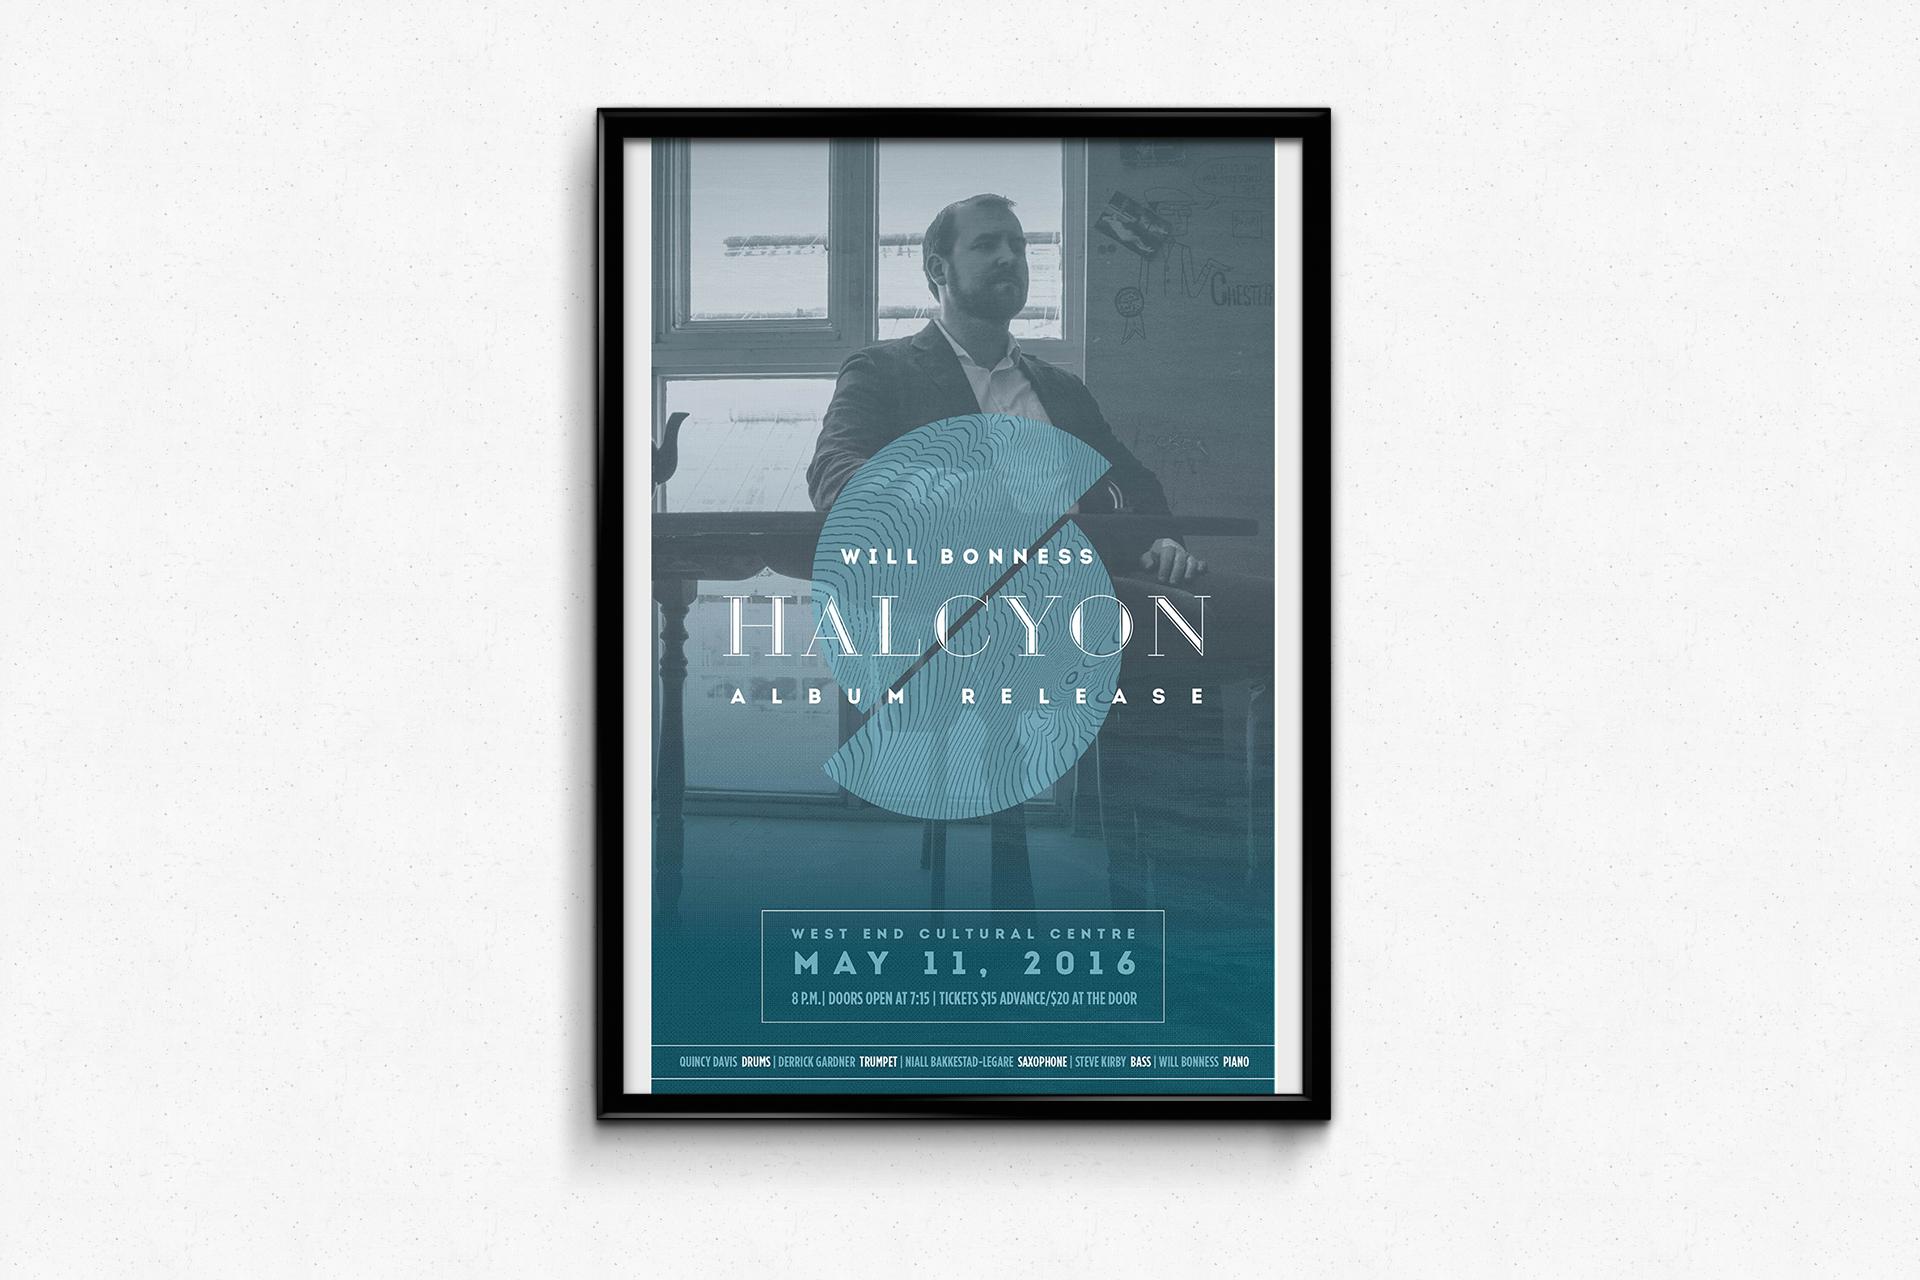 Will Bonness — Halcyon